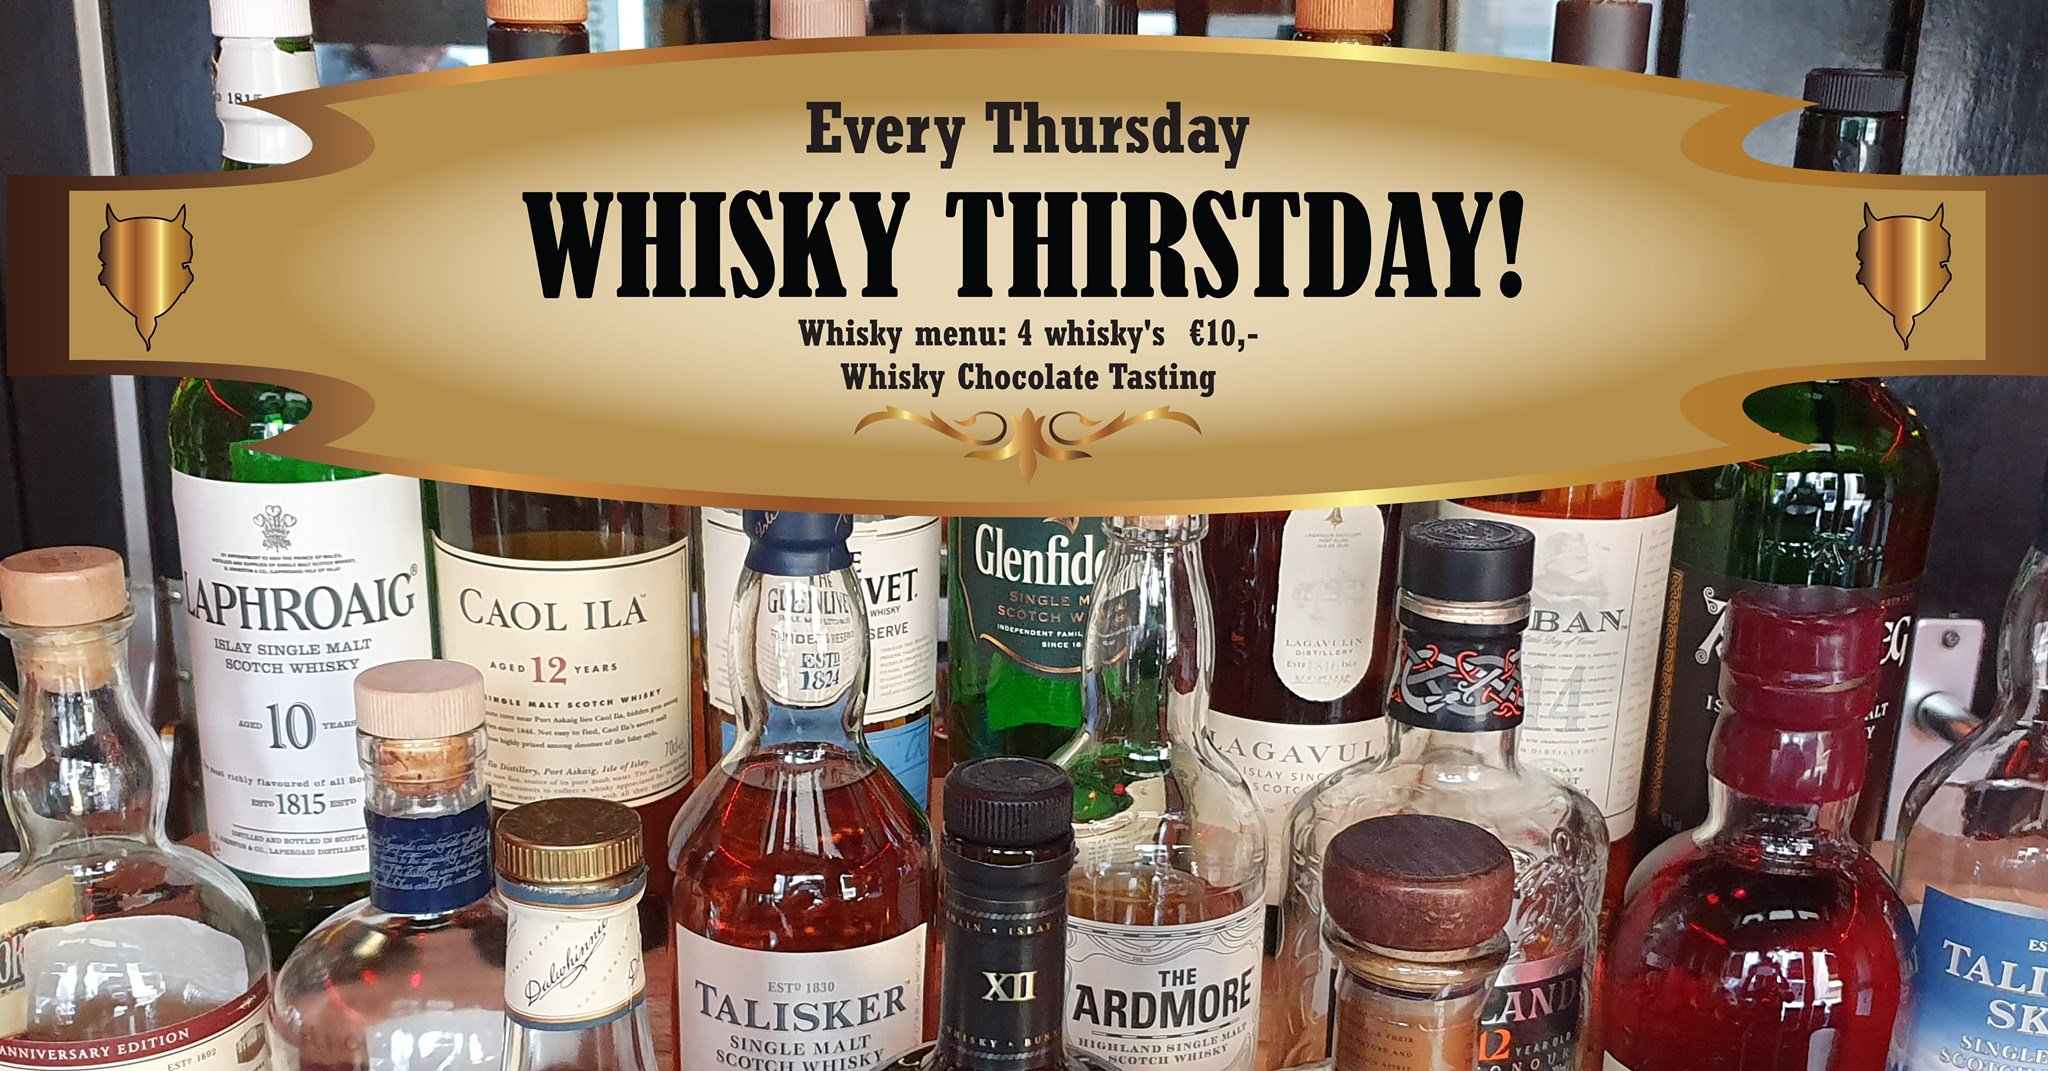 Whisky Thirstday!